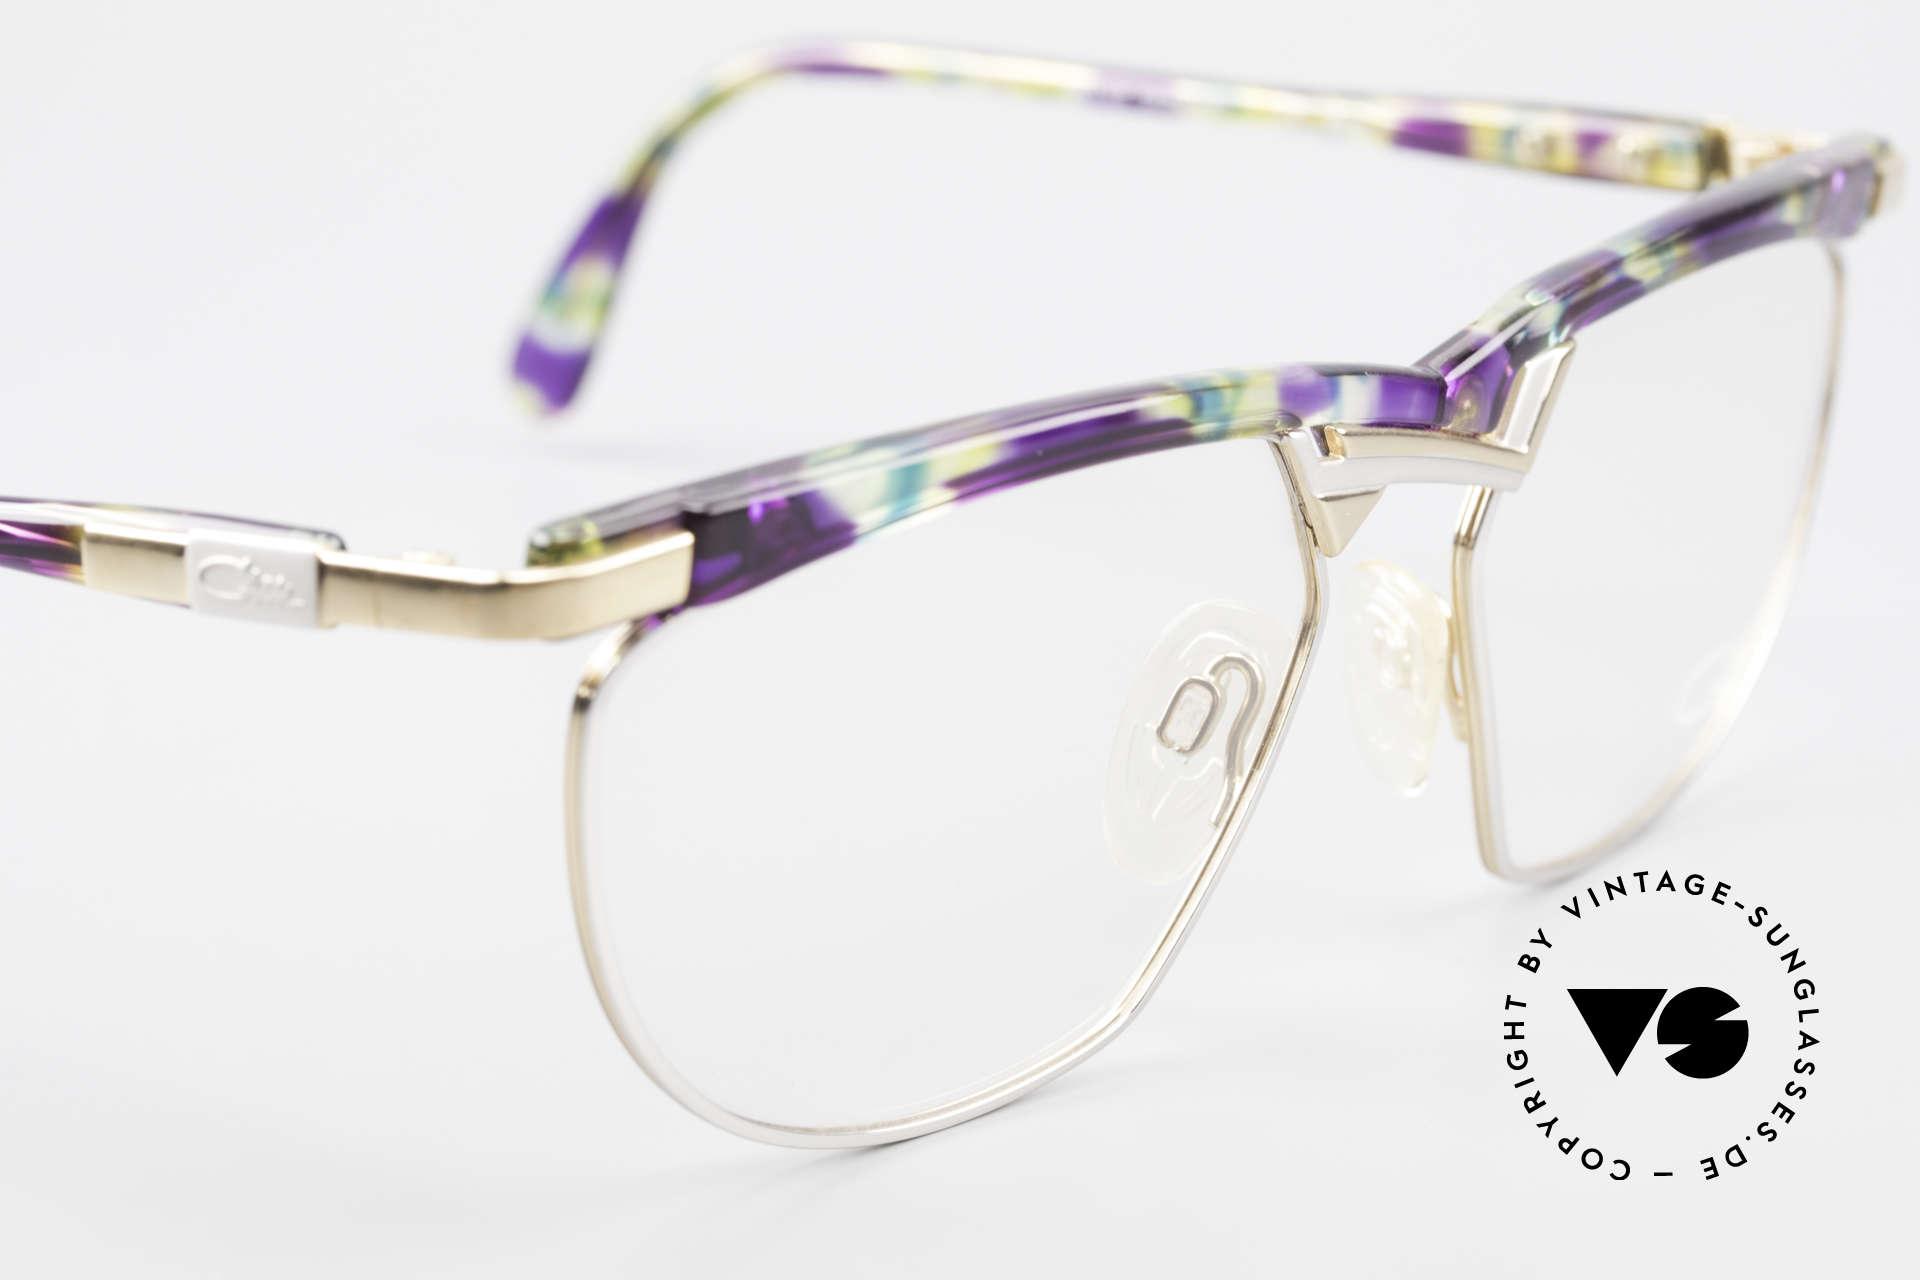 Cazal 252 90's Original True Vintage, NO RETRO designer eyewear, but a 25 years old original, Made for Men and Women